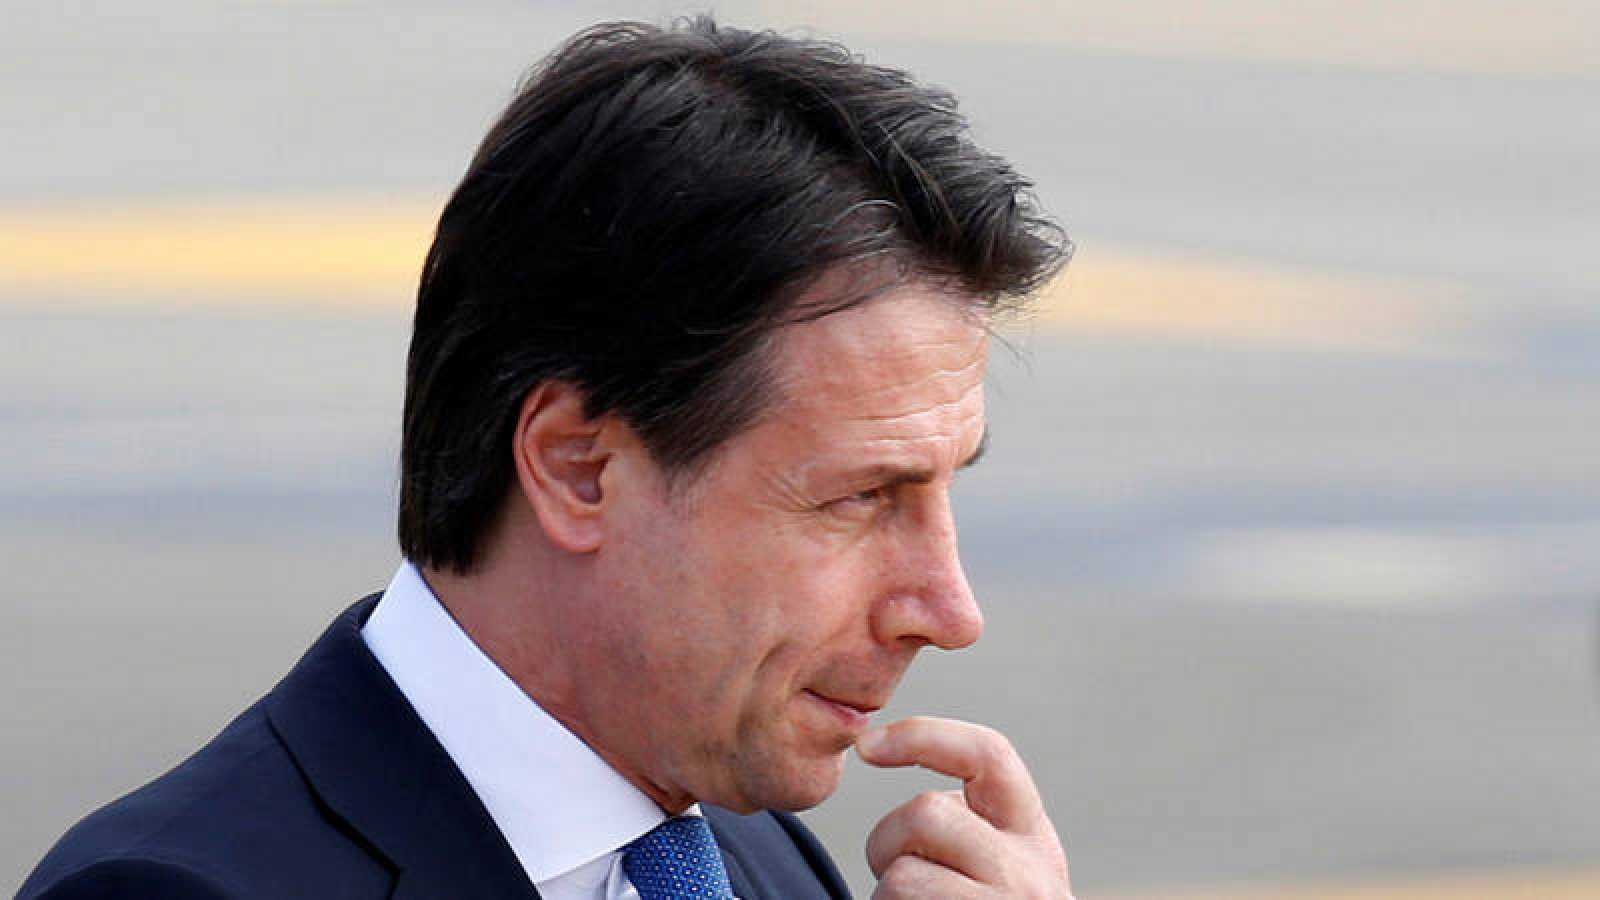 El primer ministro italiano en funciones, Giuseppe Conte, llega a Biarritz para participar en la cumbre del G7